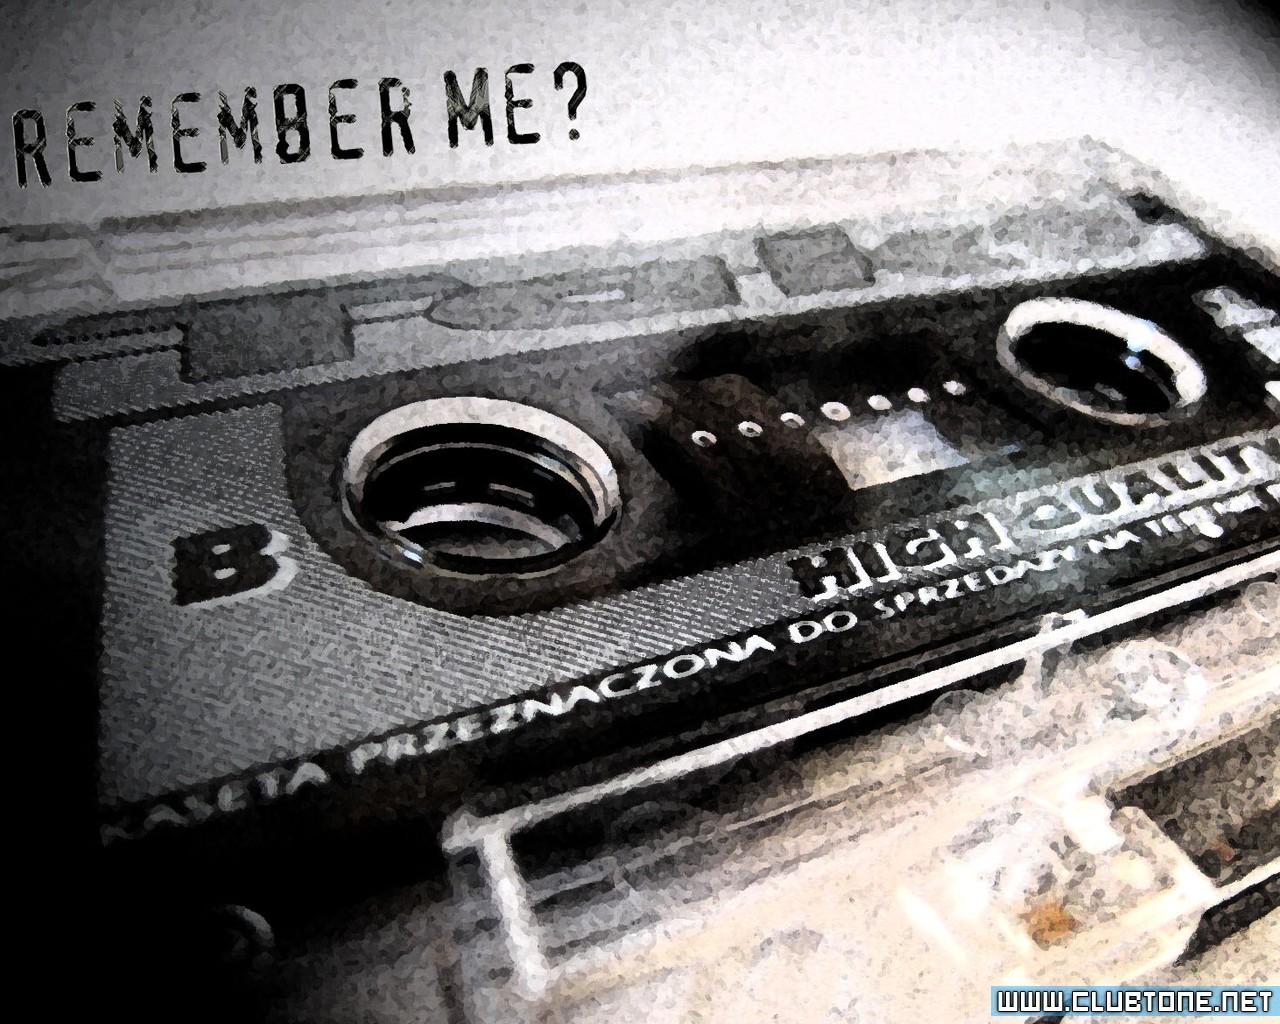 Аудиокассета своими руками